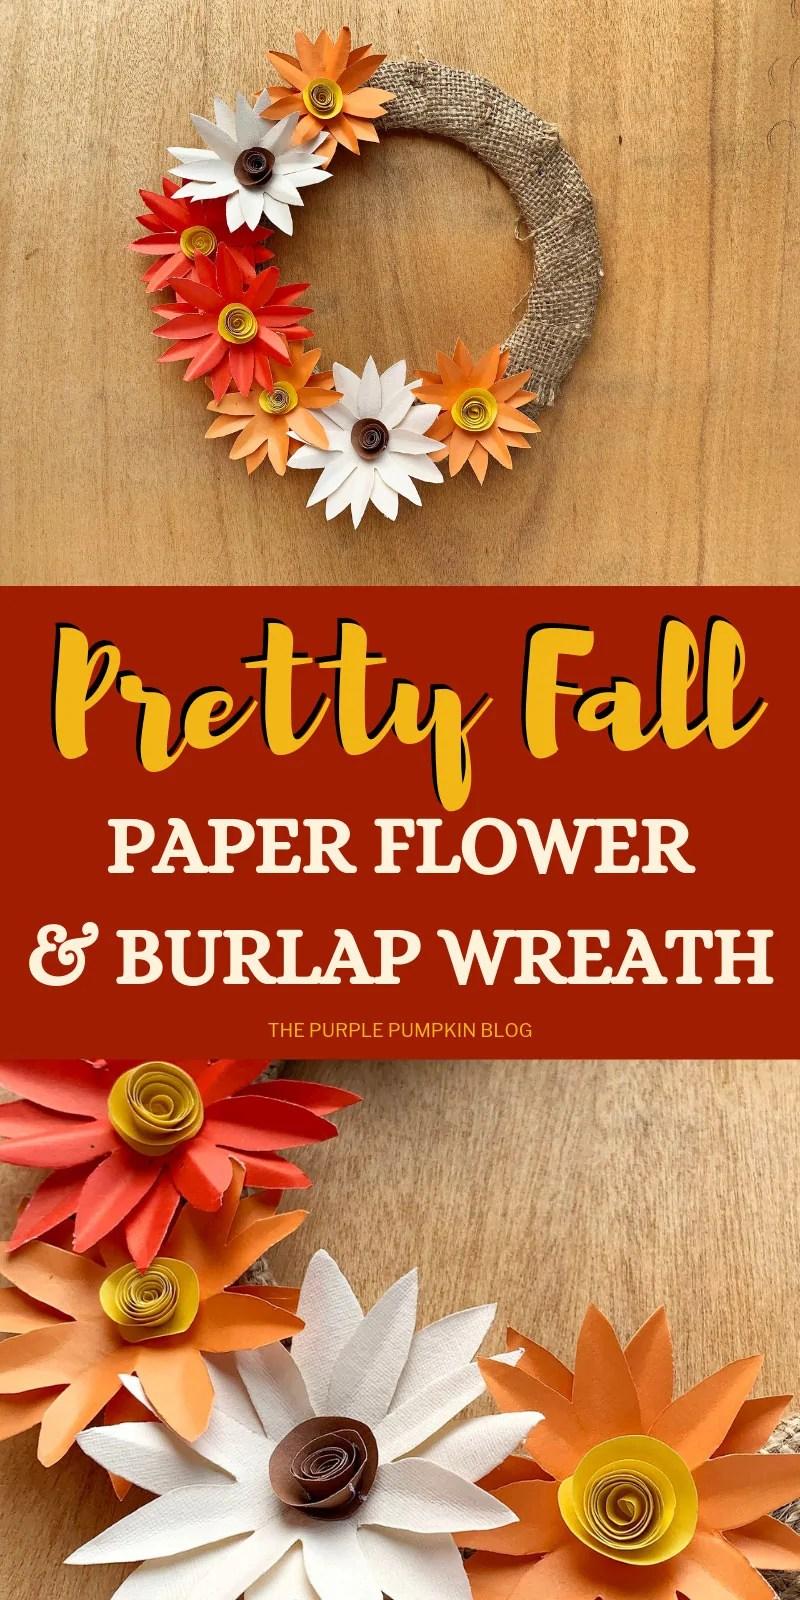 pretty fall paper flower & burlap wreath